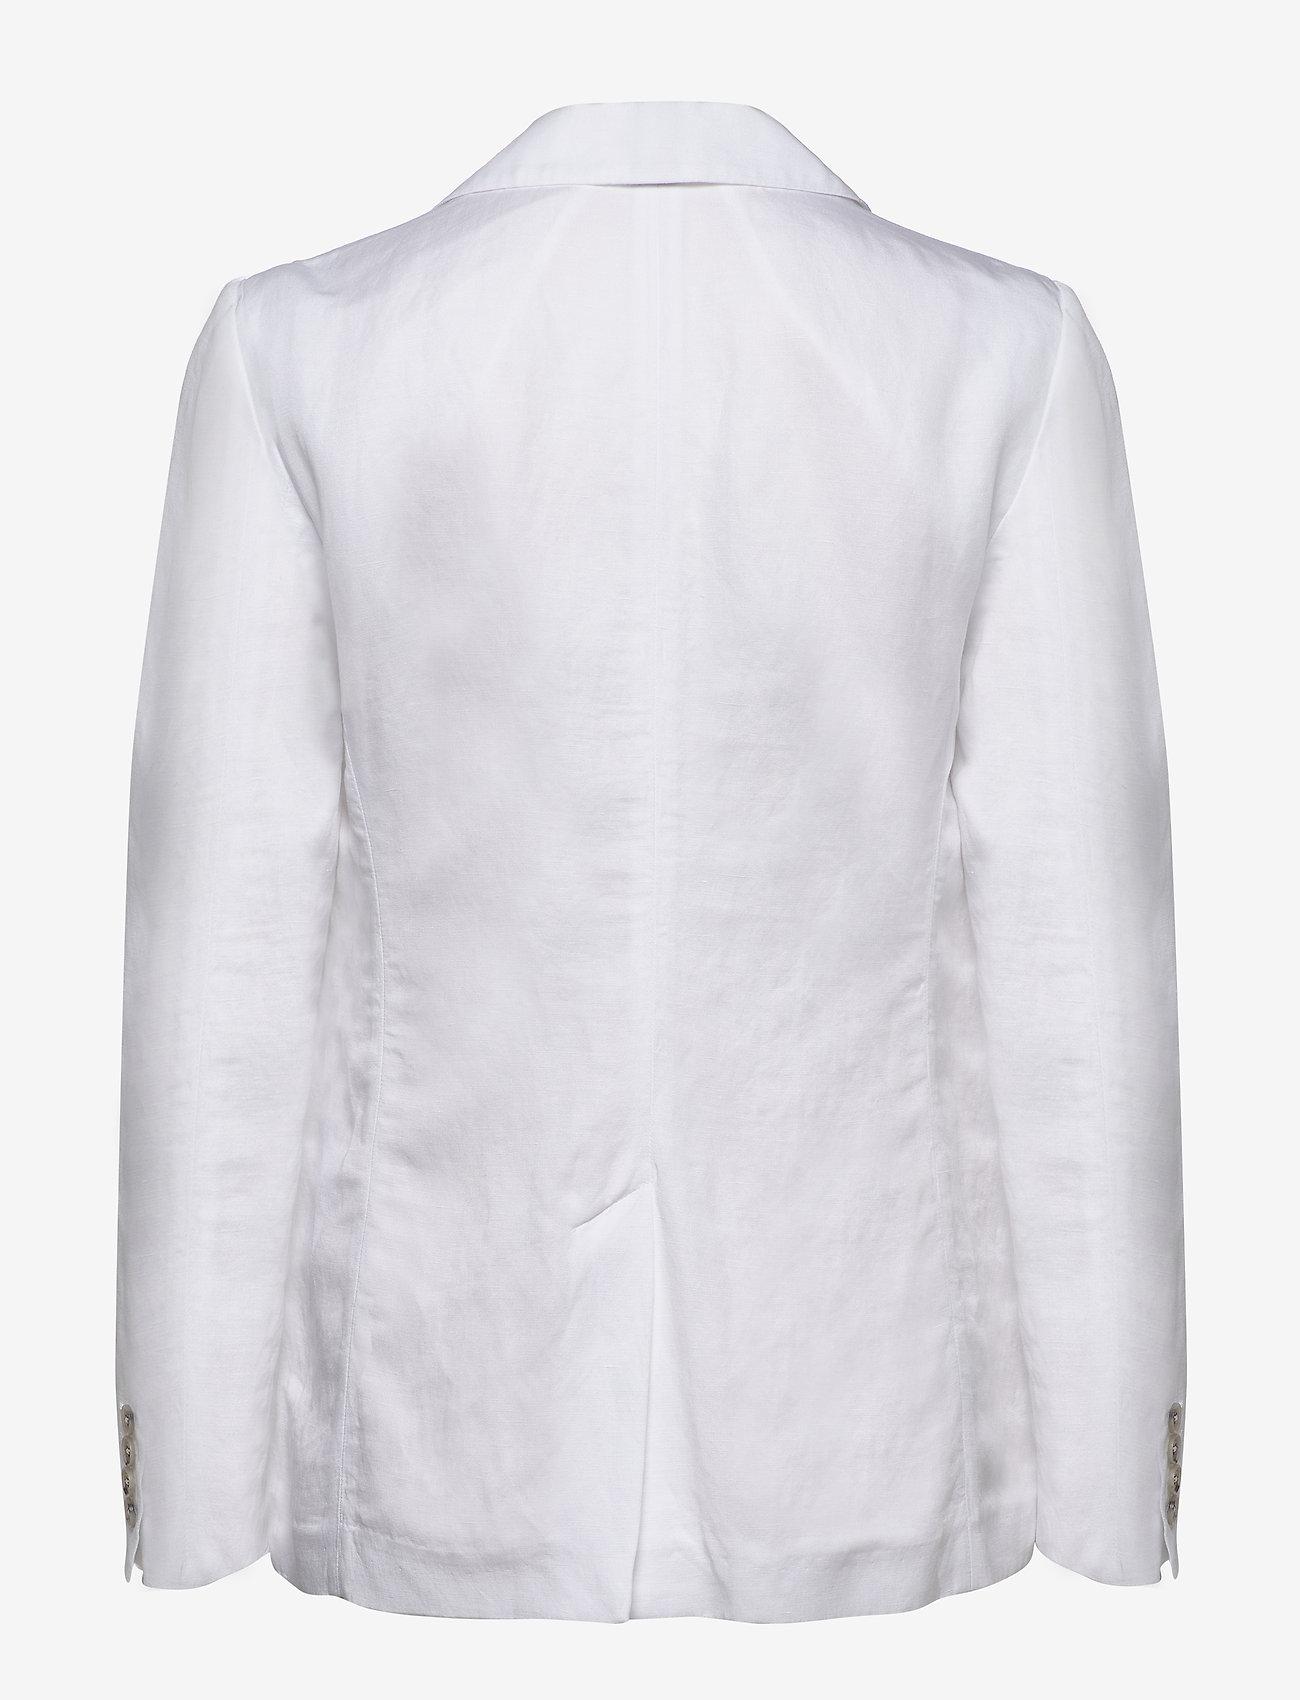 Tommy Hilfiger - LINEN TENCEL SB BLAZER - blazers - white - 1